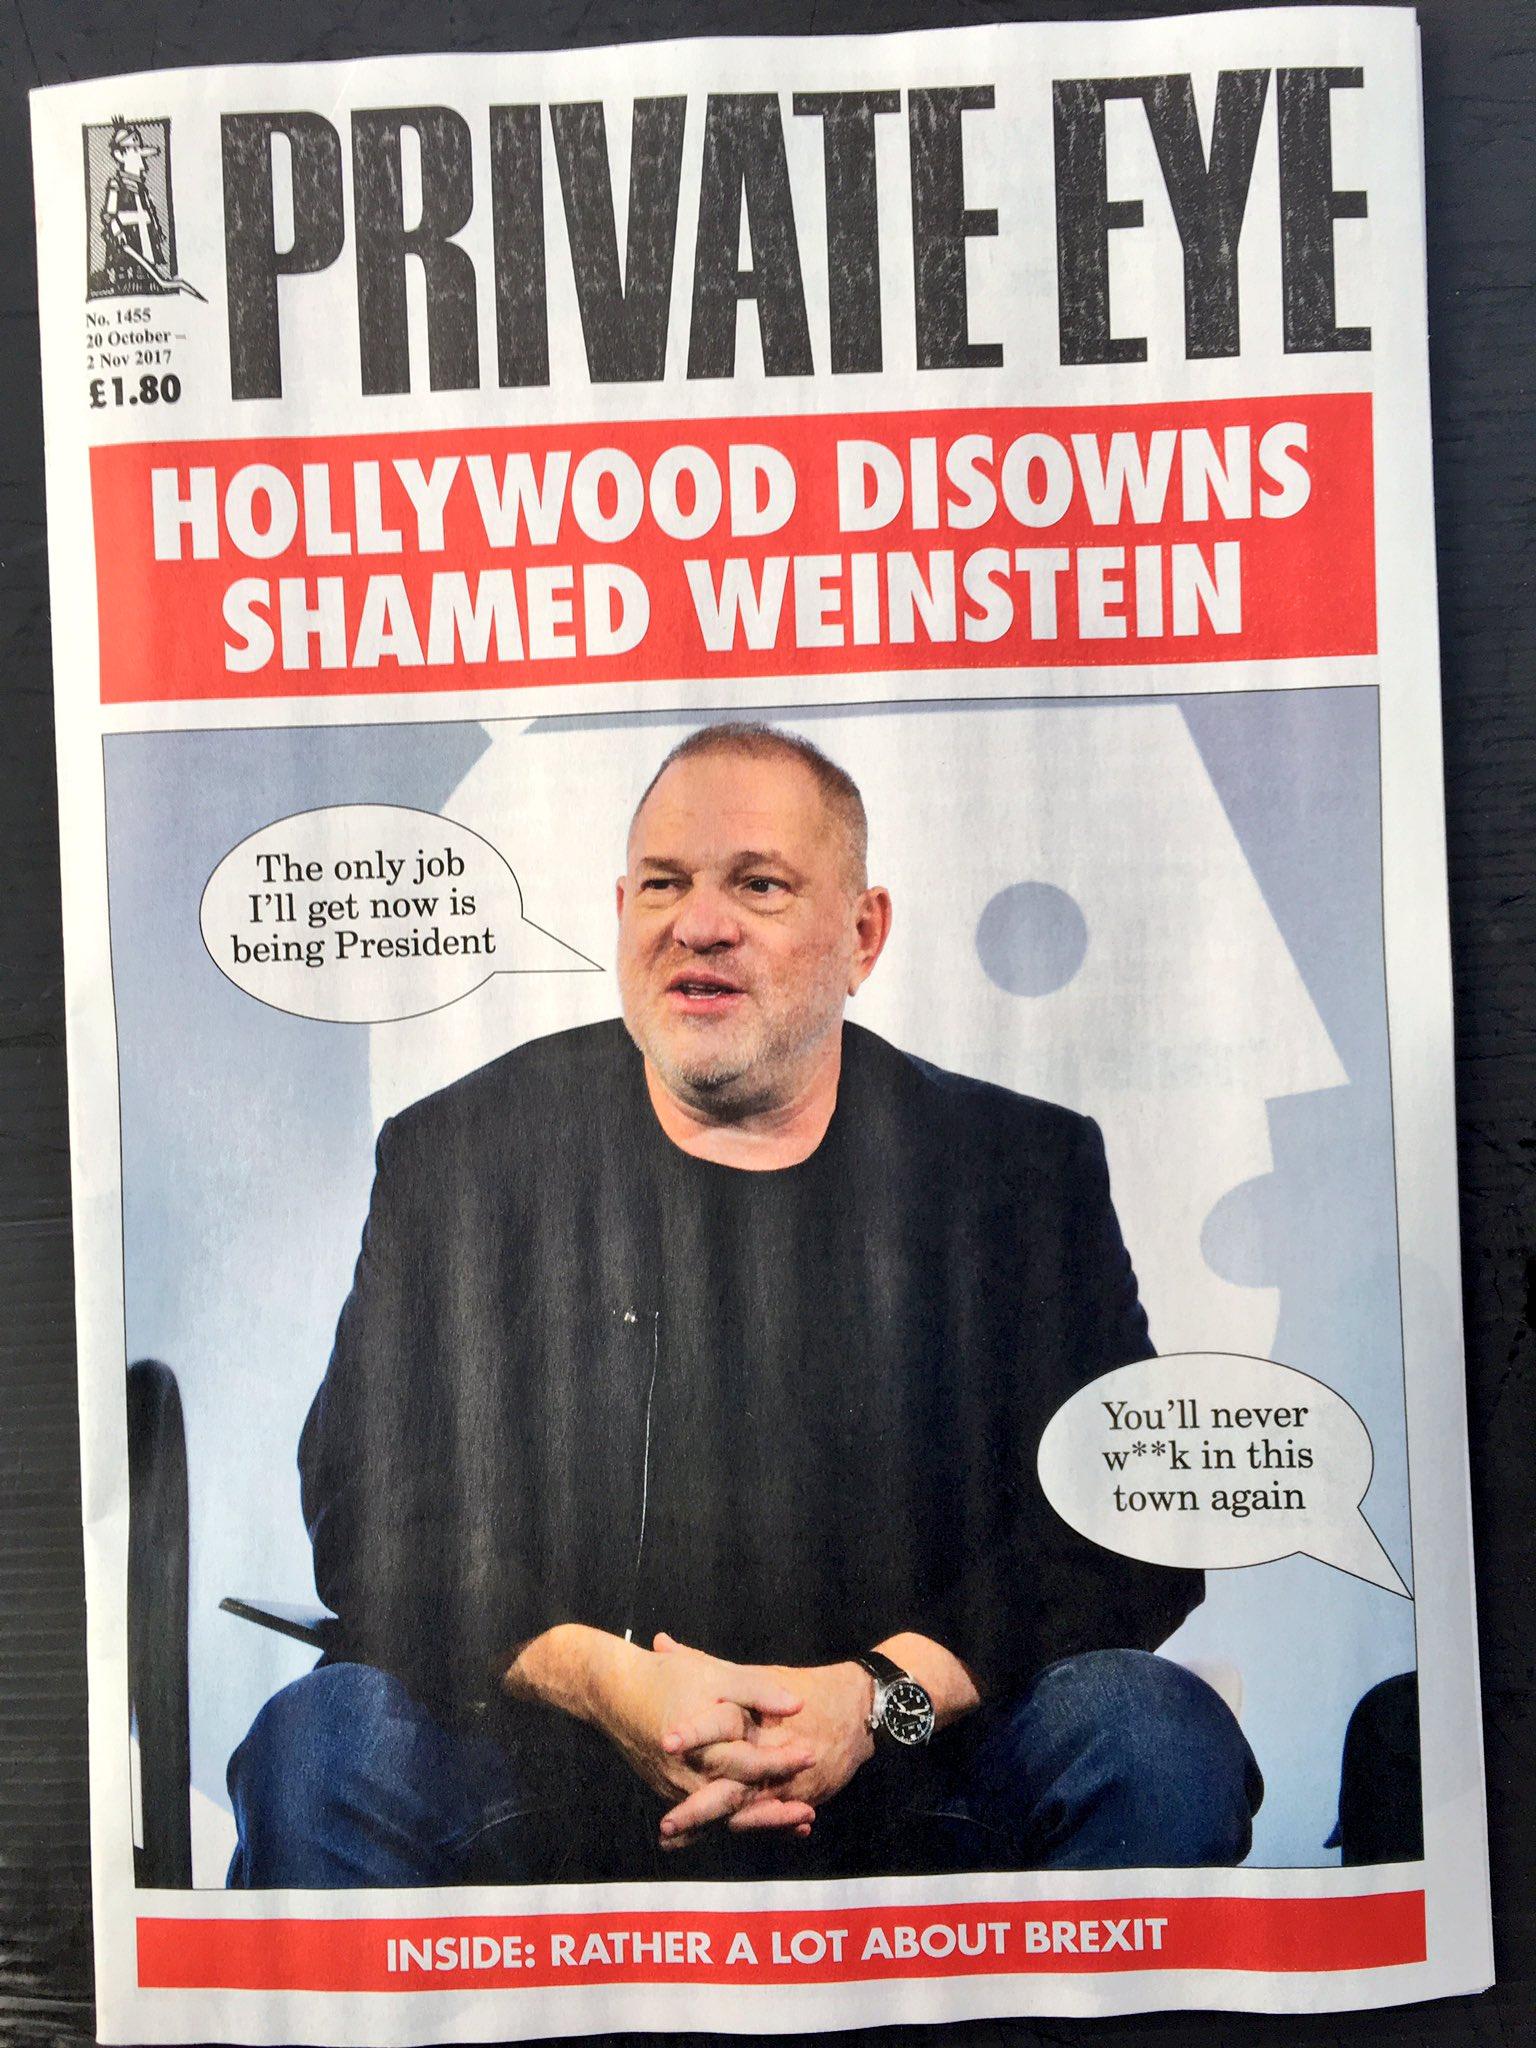 RT @ThatTimWalker: Private Eye on Weinstein today https://t.co/pMg0f1XW78